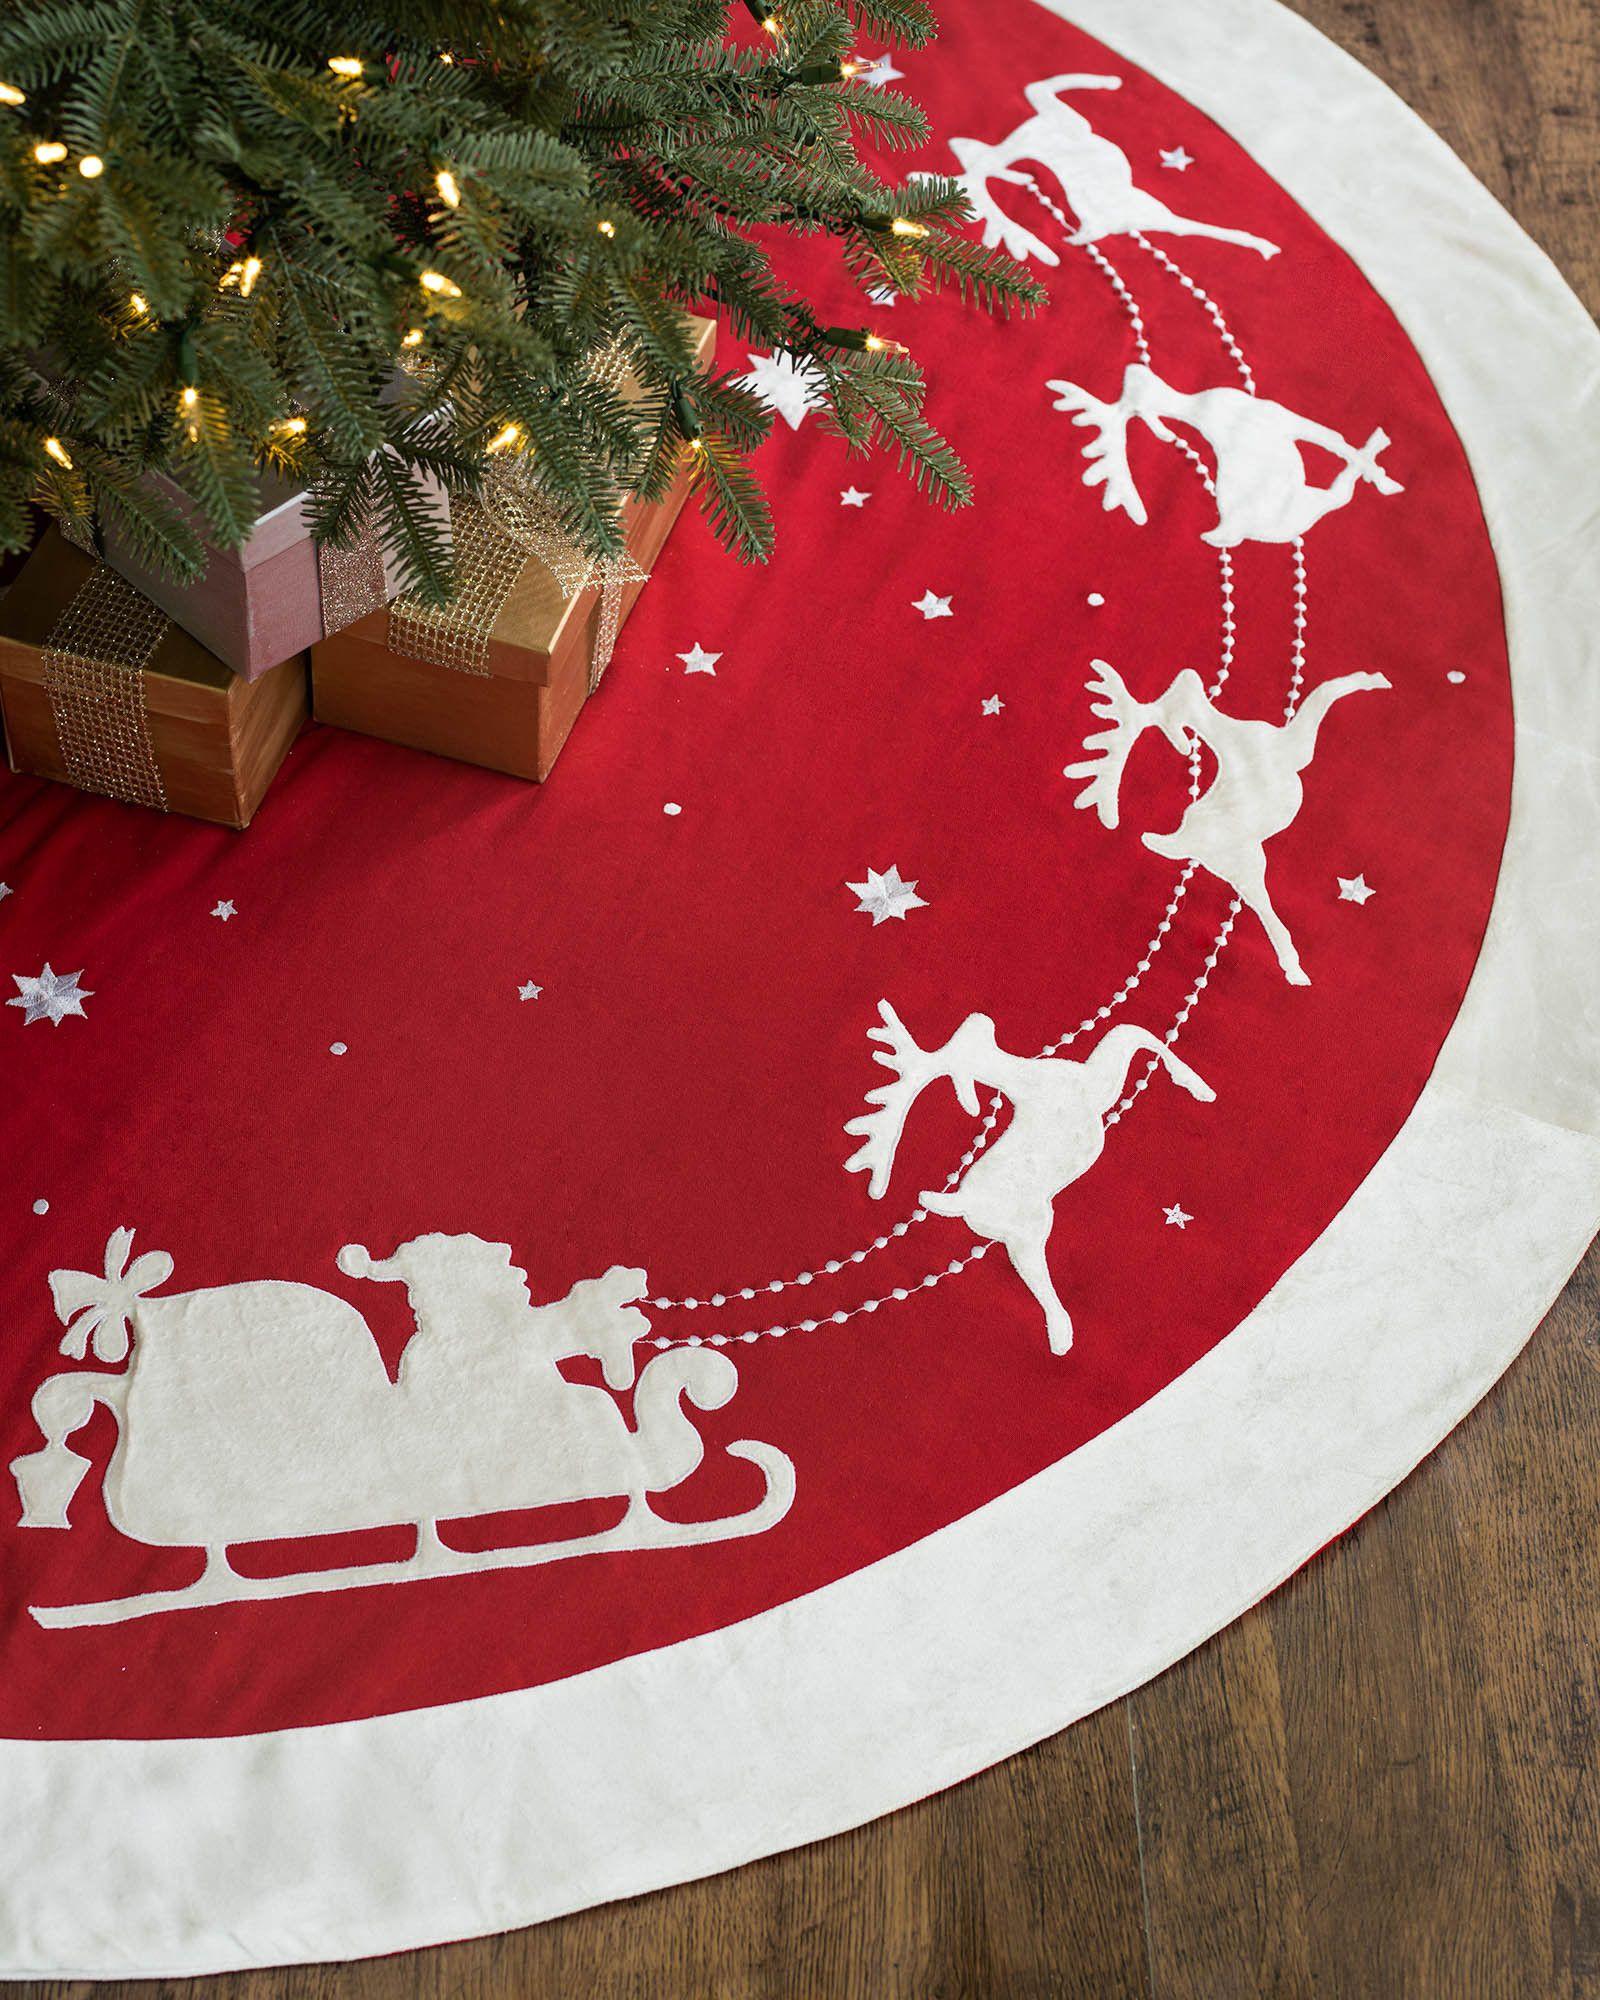 Dashing Through the Snow Christmas Tree Skirt | Balsam Hill